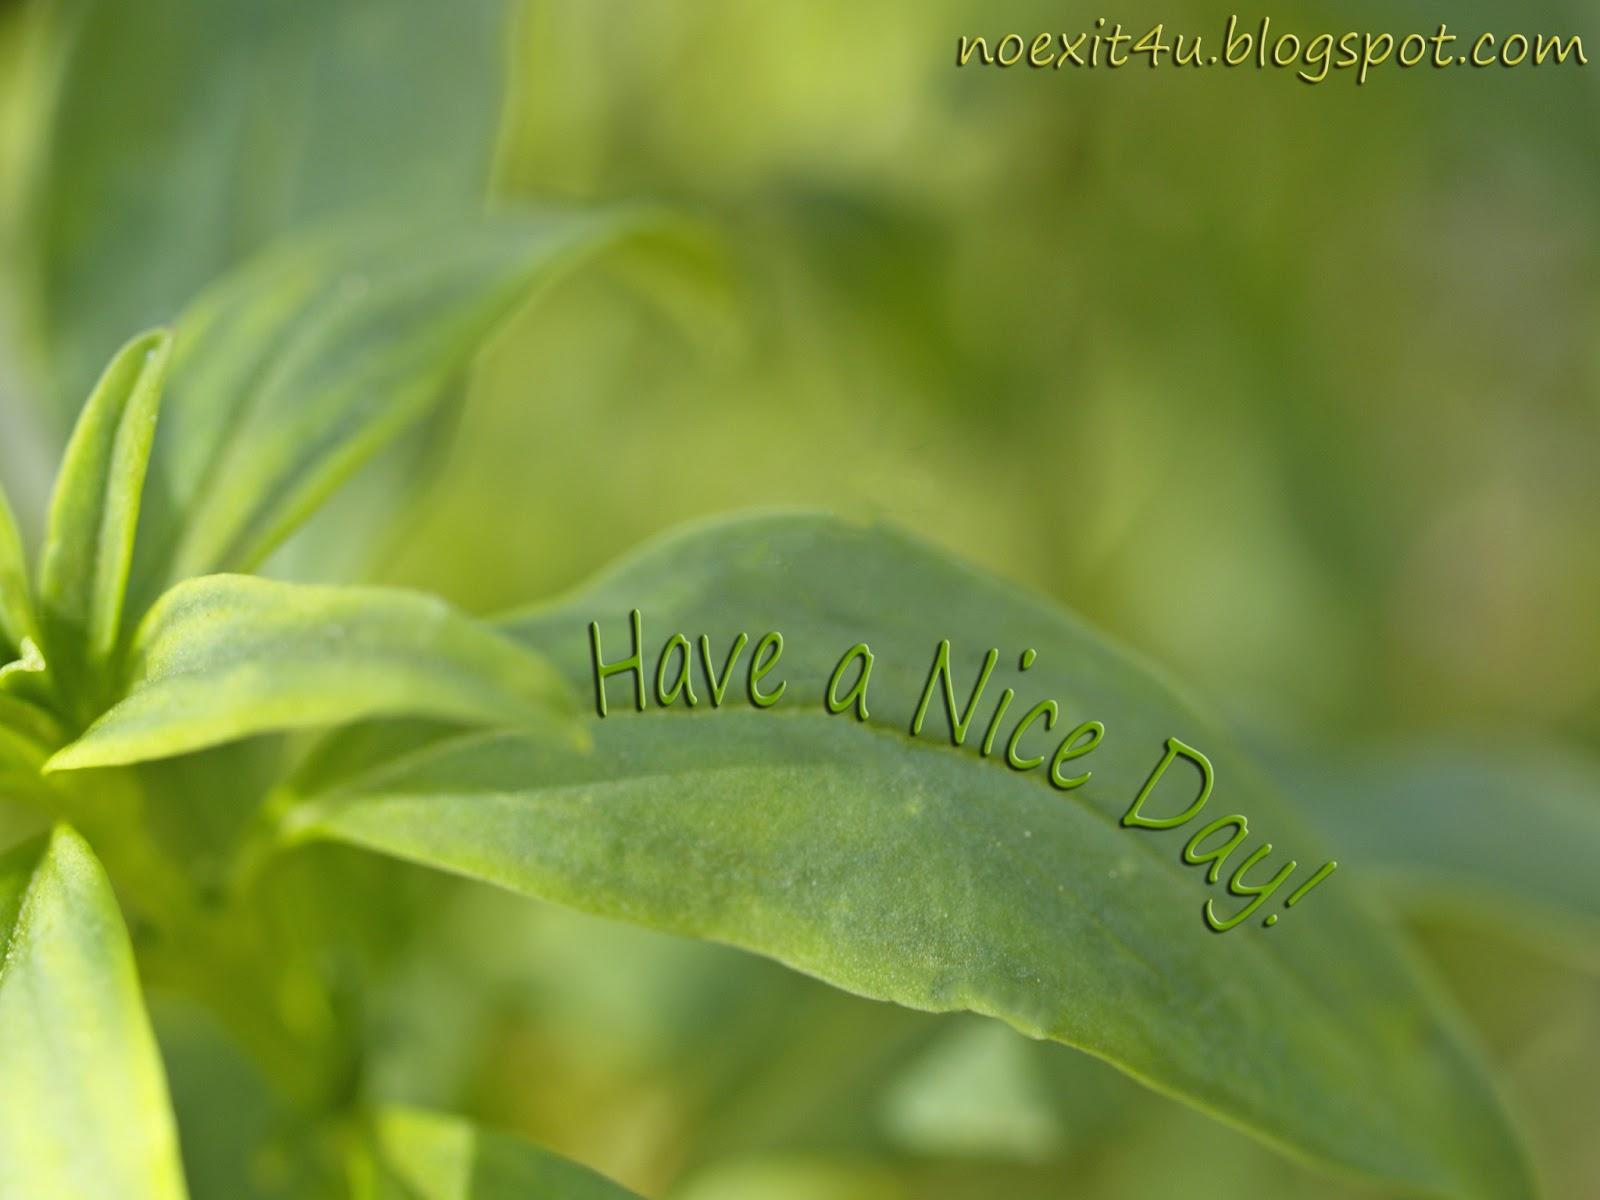 HAVE A NICE DAY WALLPAPER (HD) ~ noexit4u.com